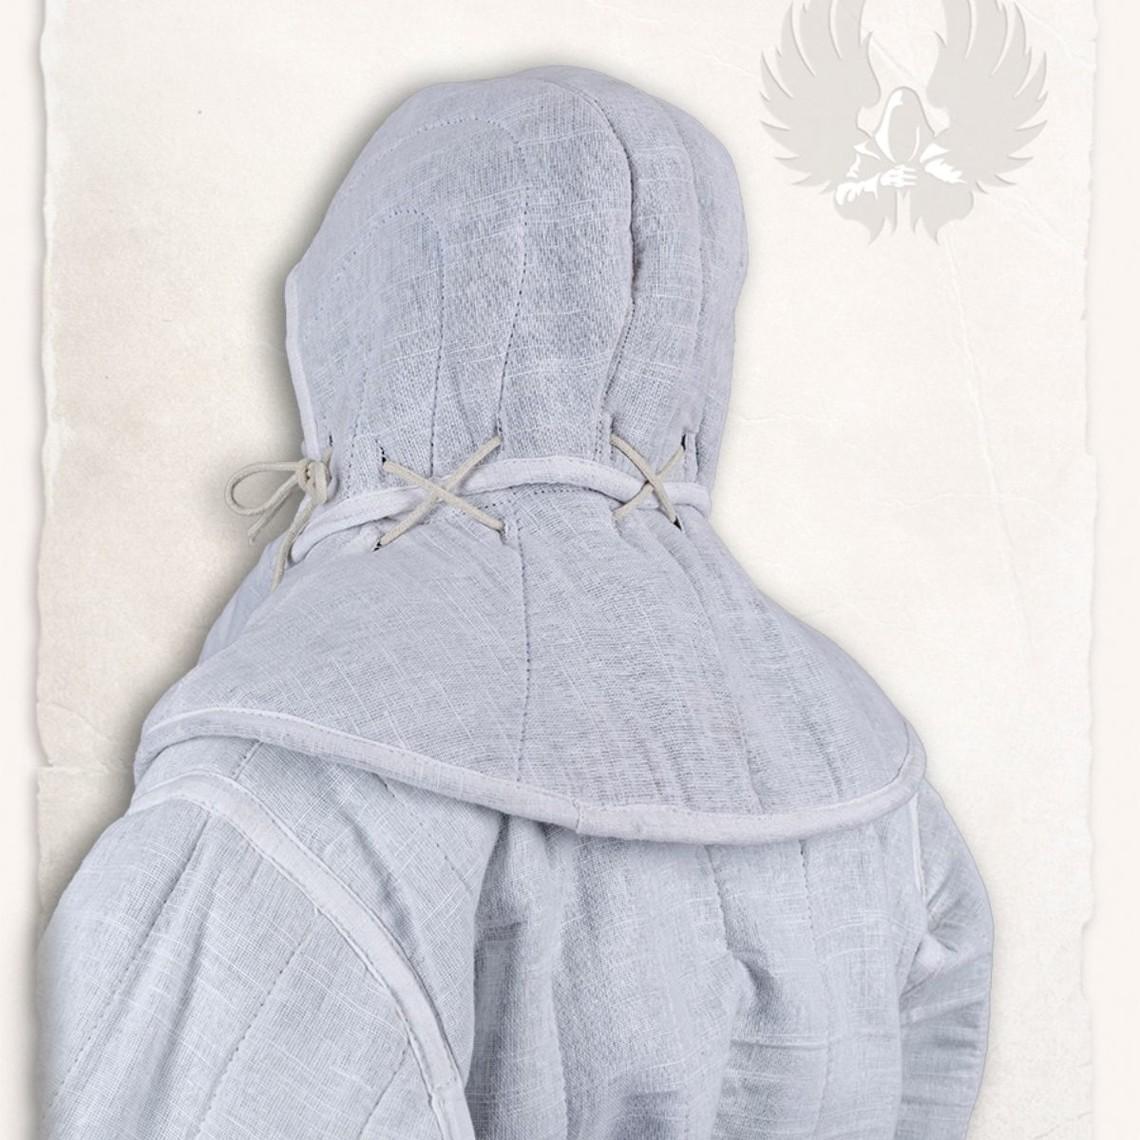 Mytholon campana Gambesón y cuello blanco lino Aulber